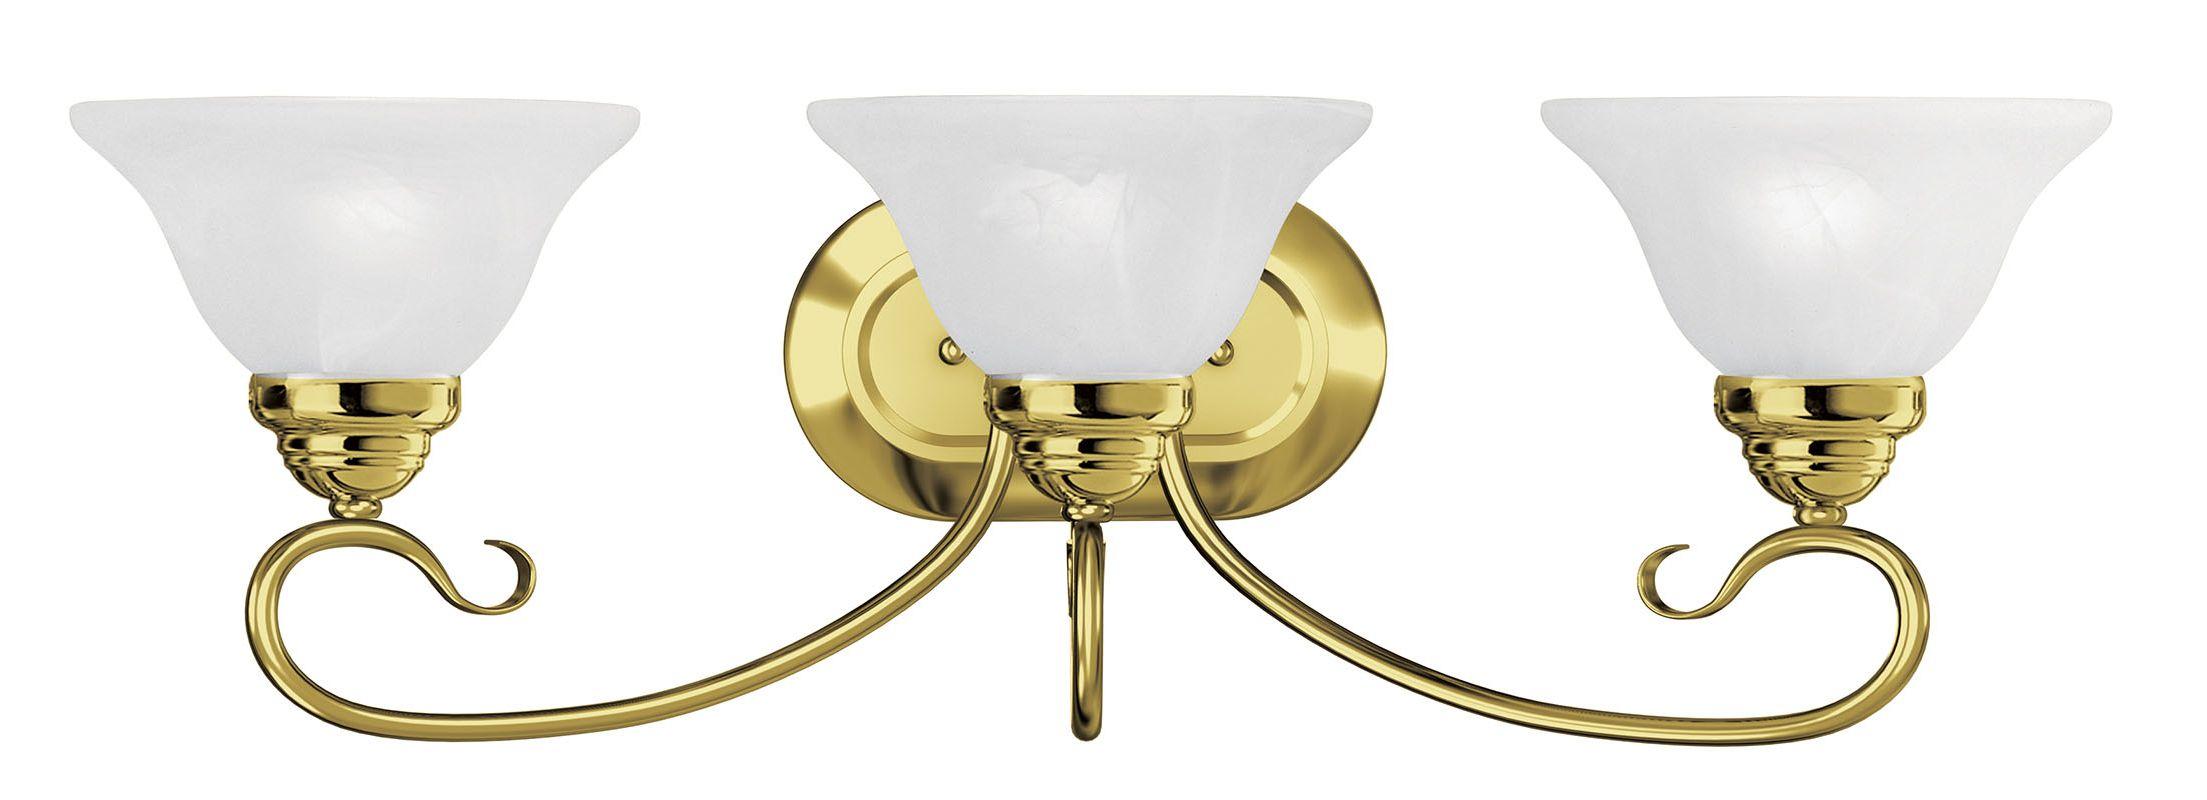 Livex Lighting 6103 Coronado 3 Light Bathroom Vanity Light Polished